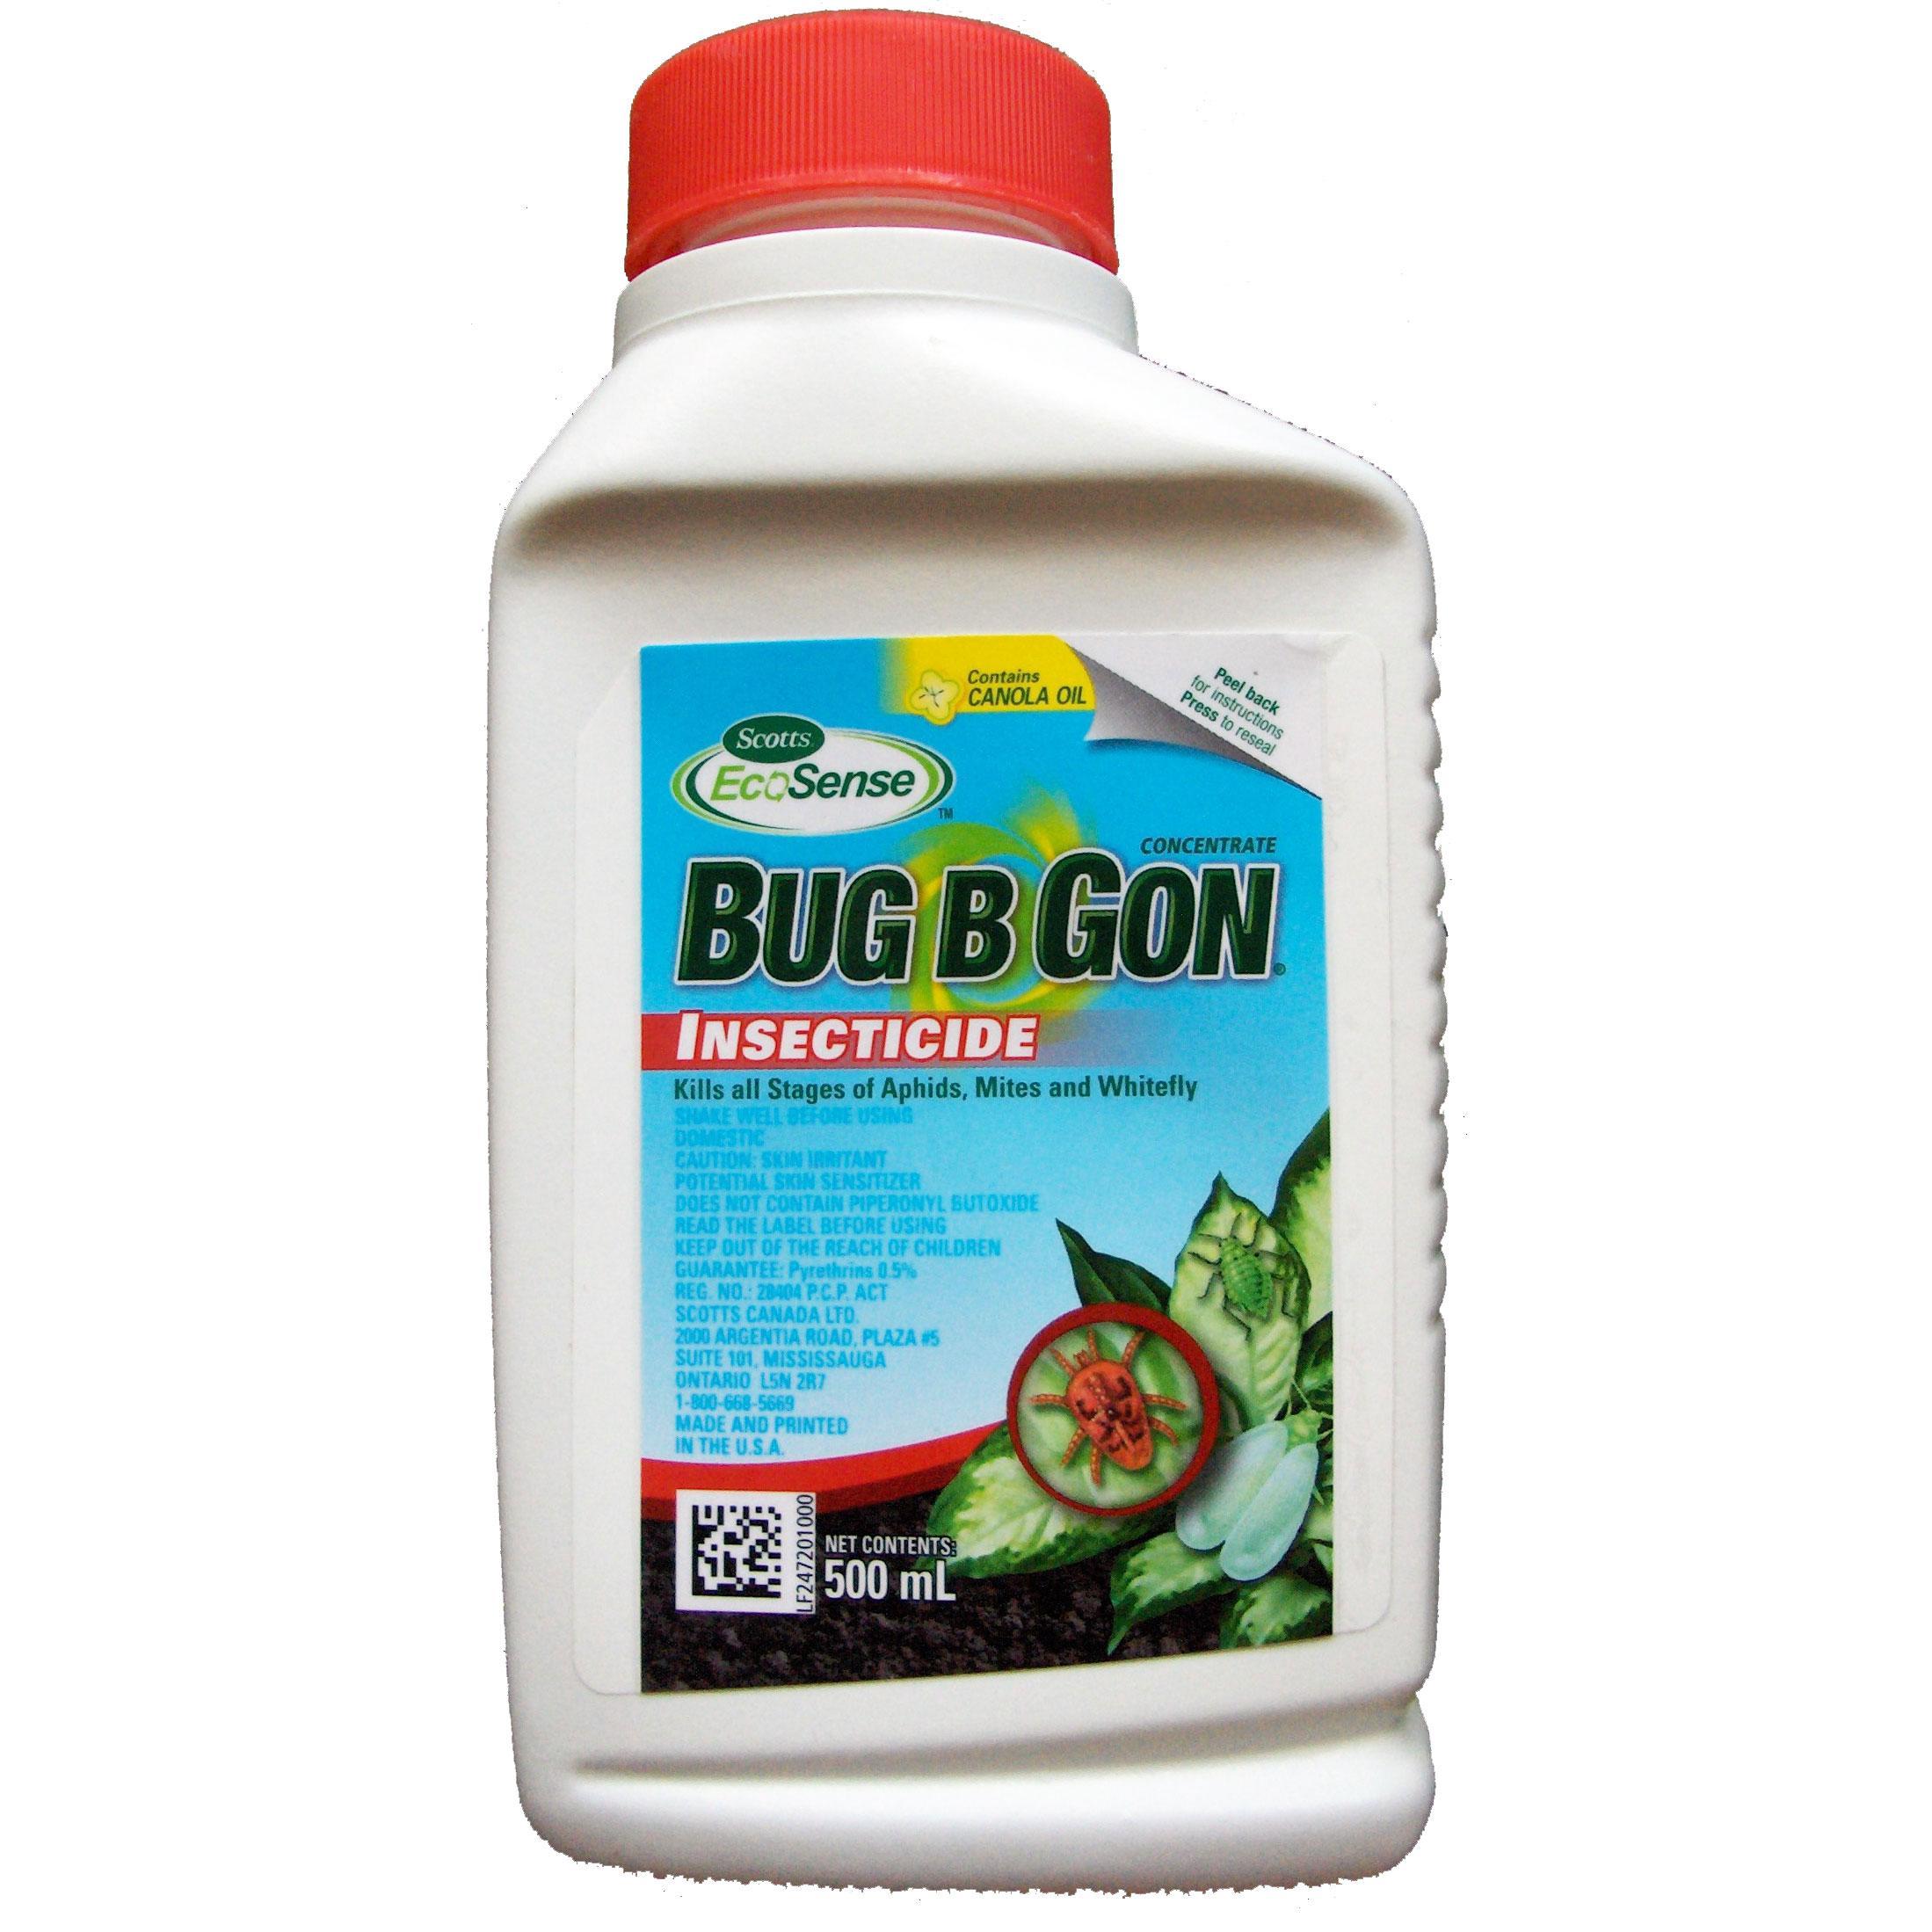 EcoSense Bug-B-Gon